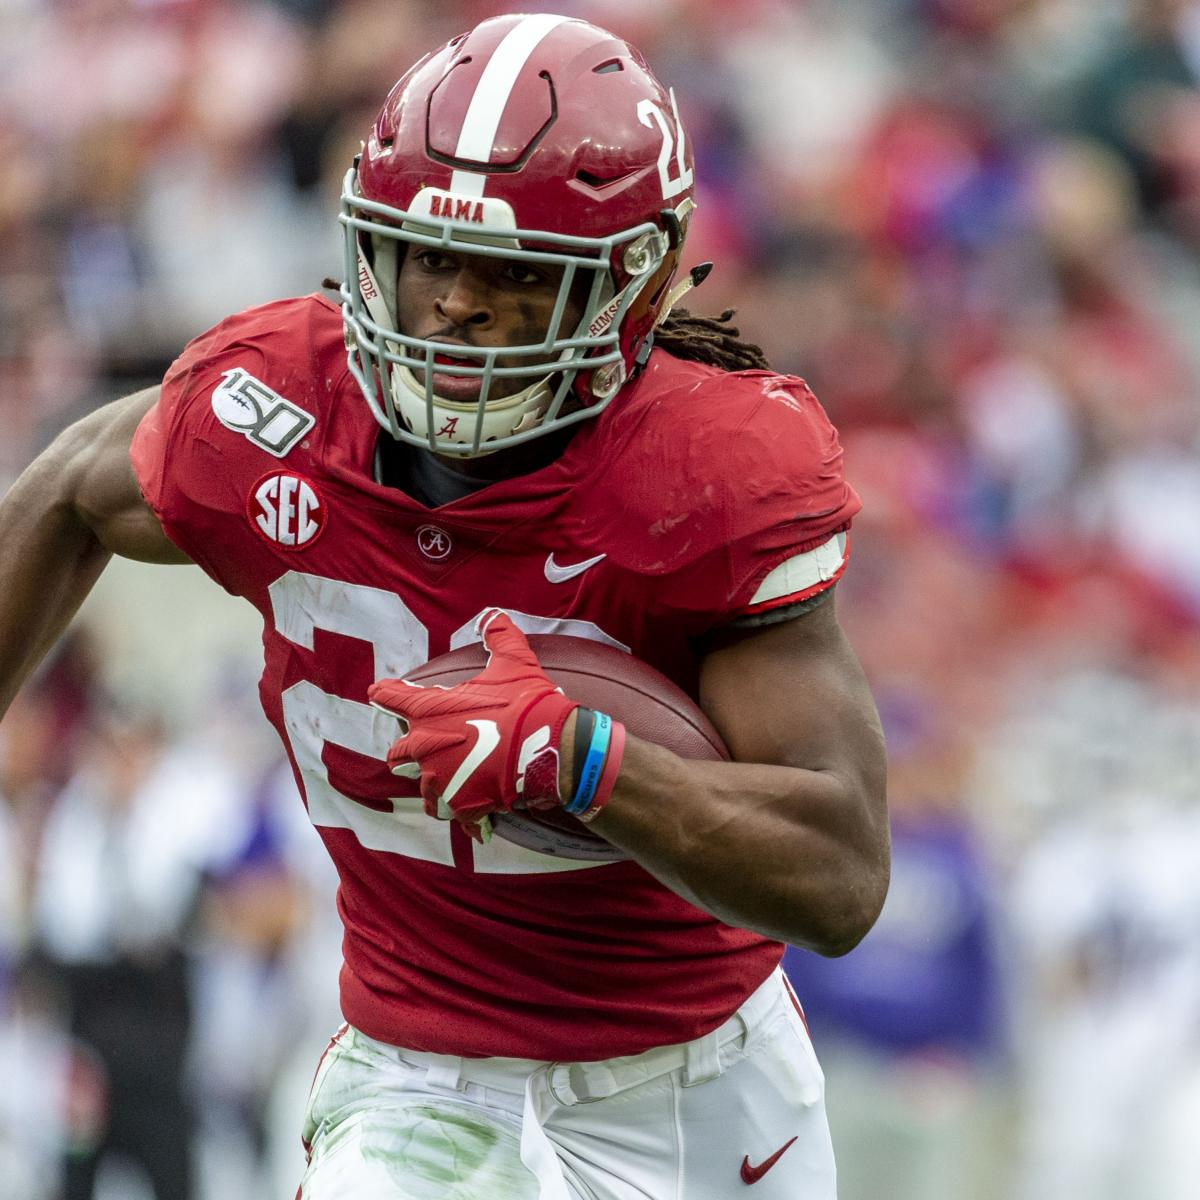 Best Neutral-Site Games in 2020 College Football Season